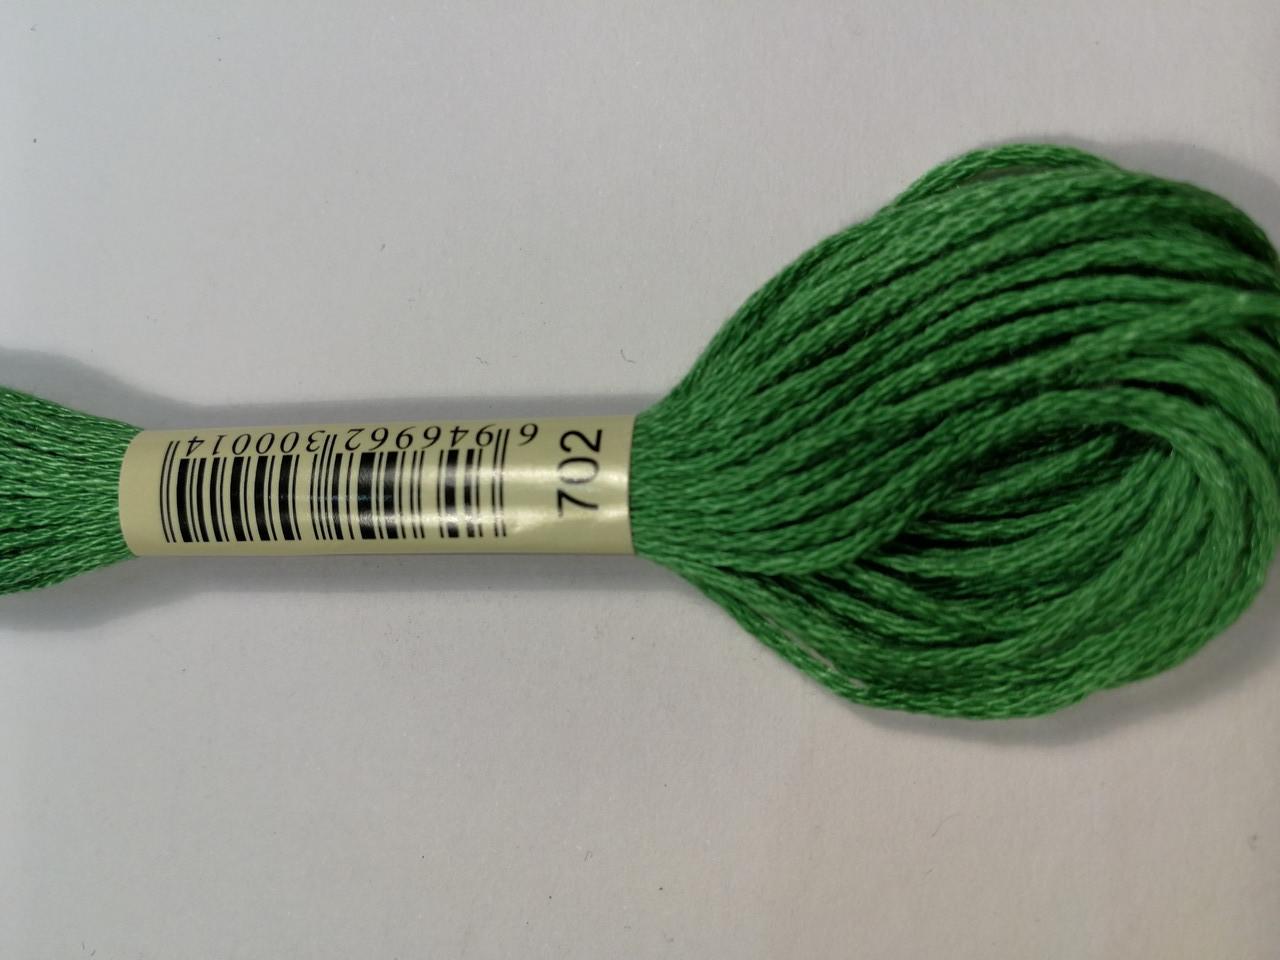 Мулине СХС 702 желто-зеленый